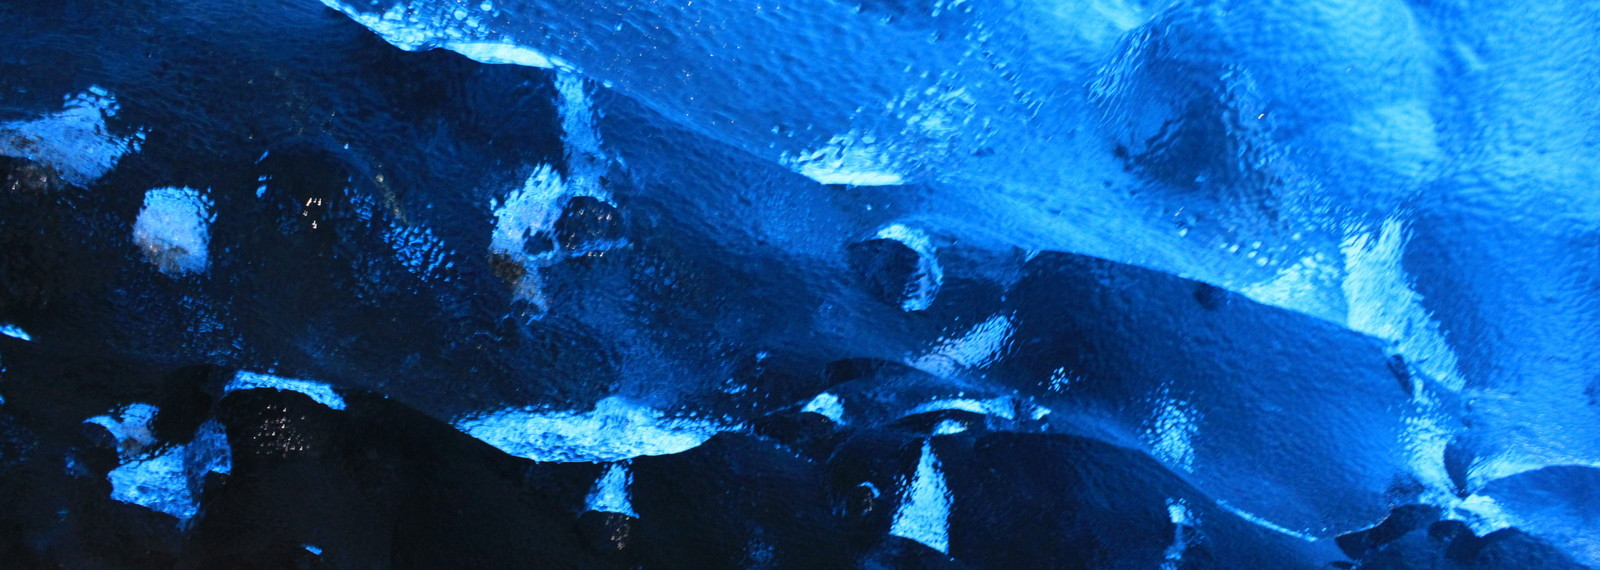 Ice Cave Tour - Big Ice Cave